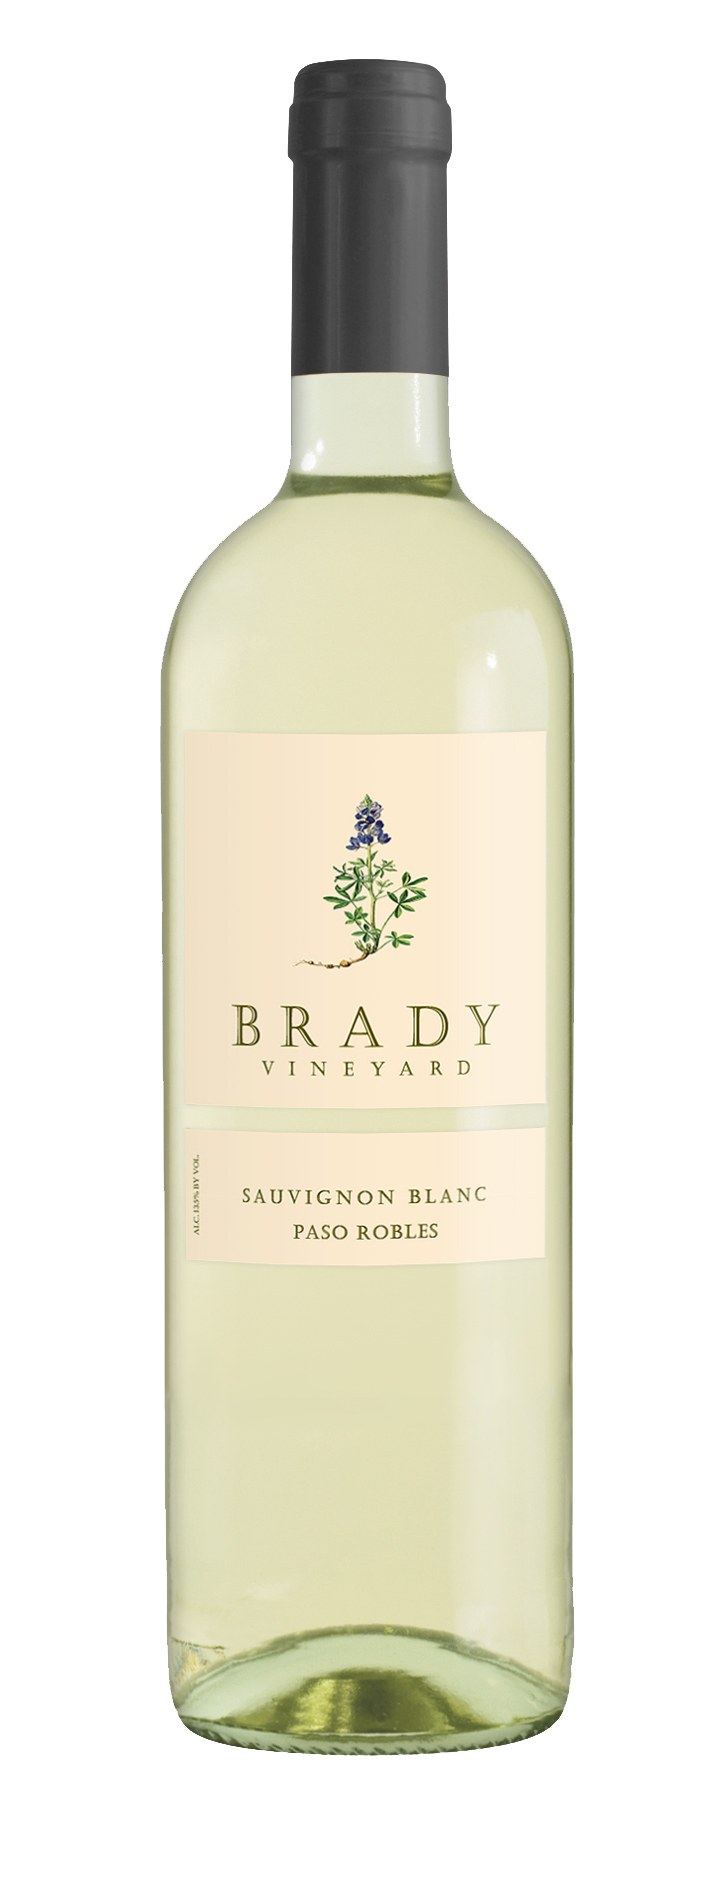 Brady Vineyard Releases 2015 Sauvignon Blanc